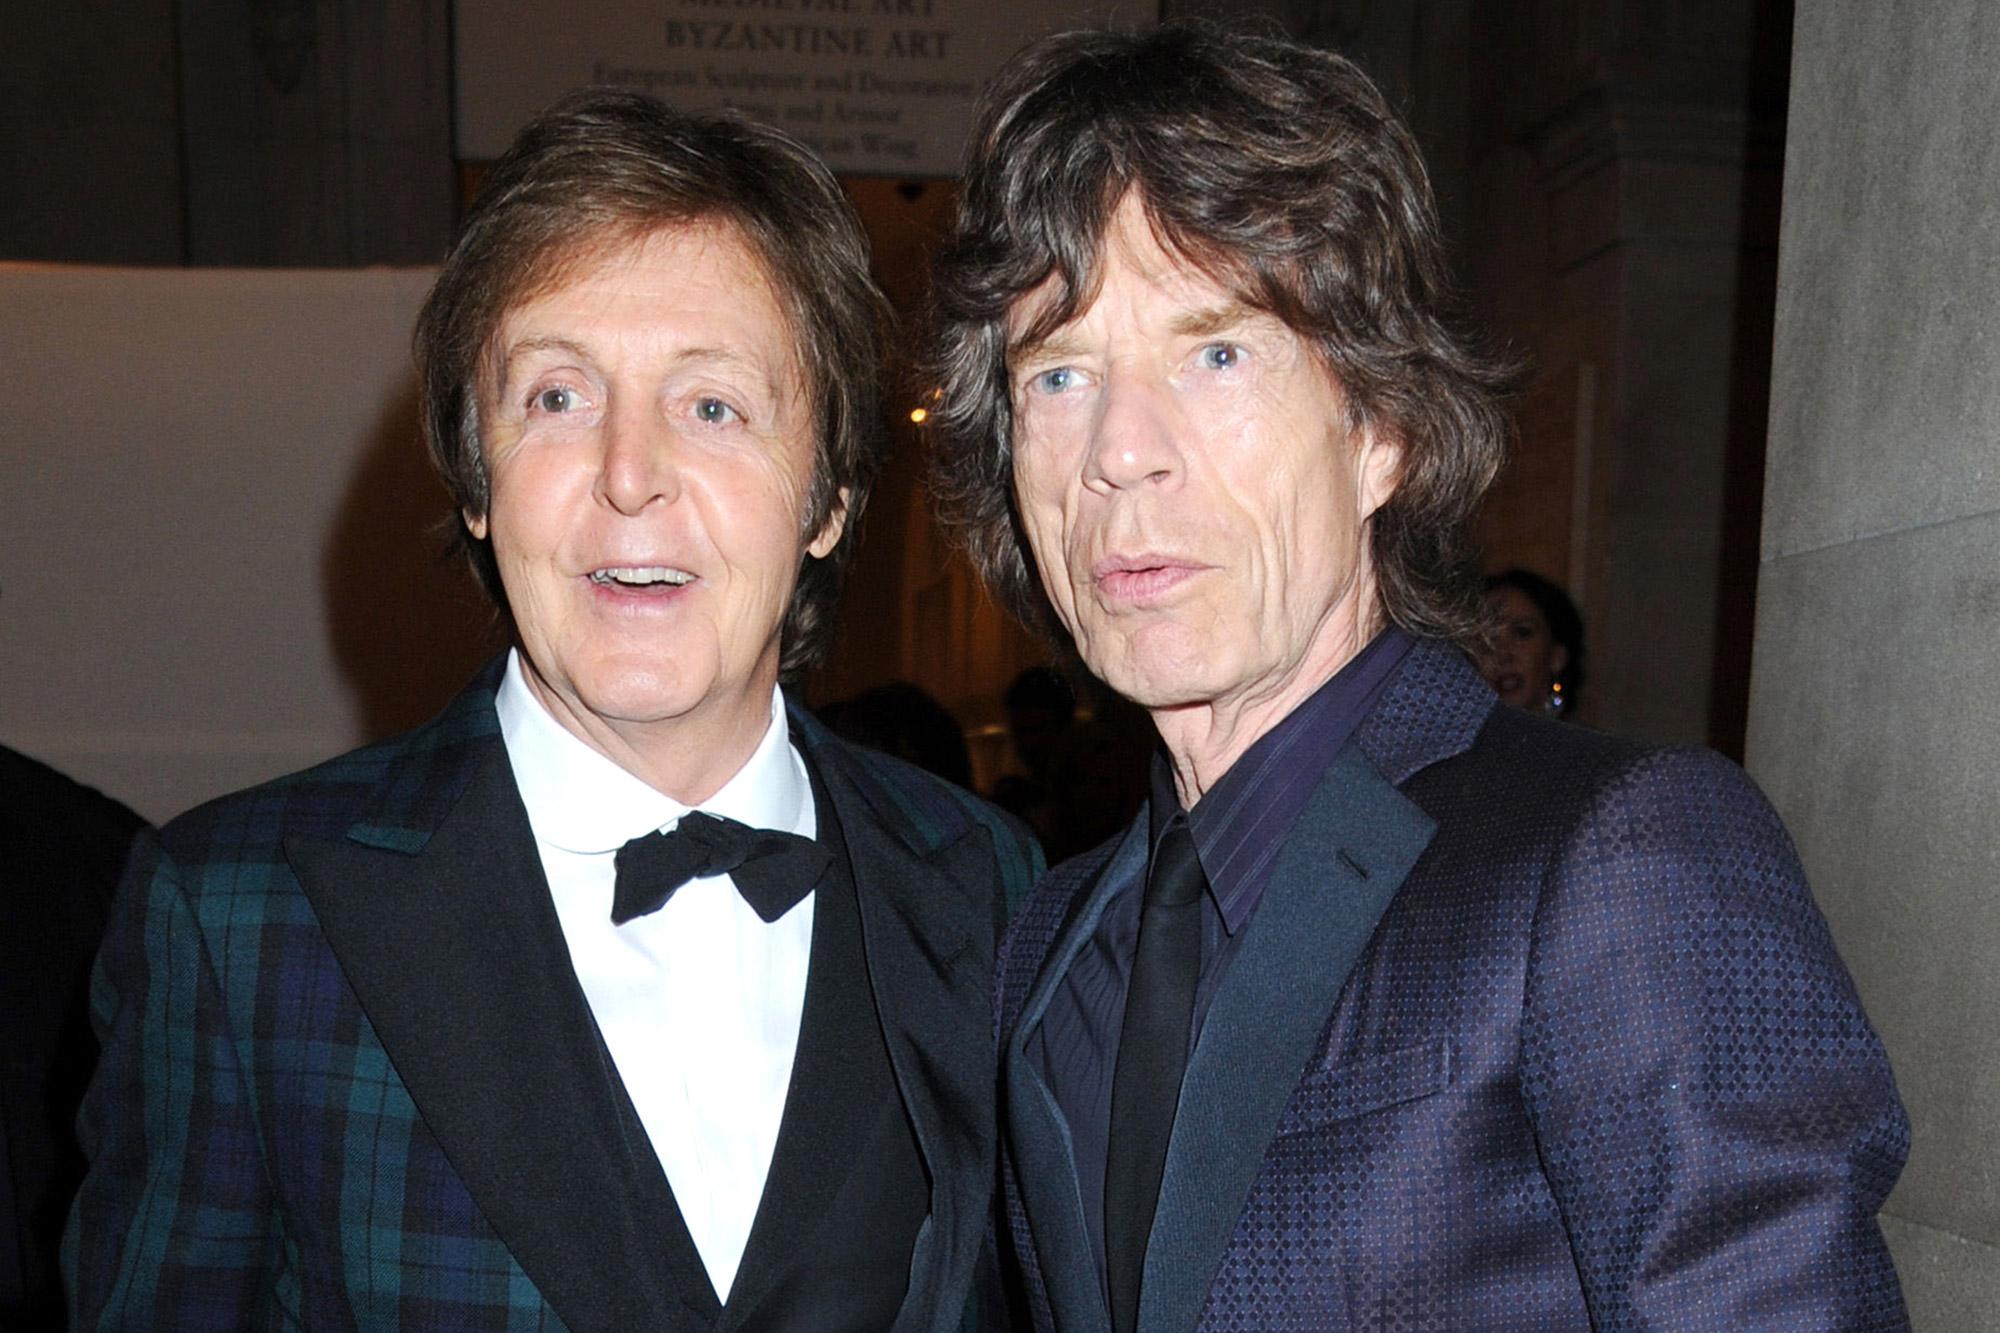 Paul McCartney and Mick Jagger